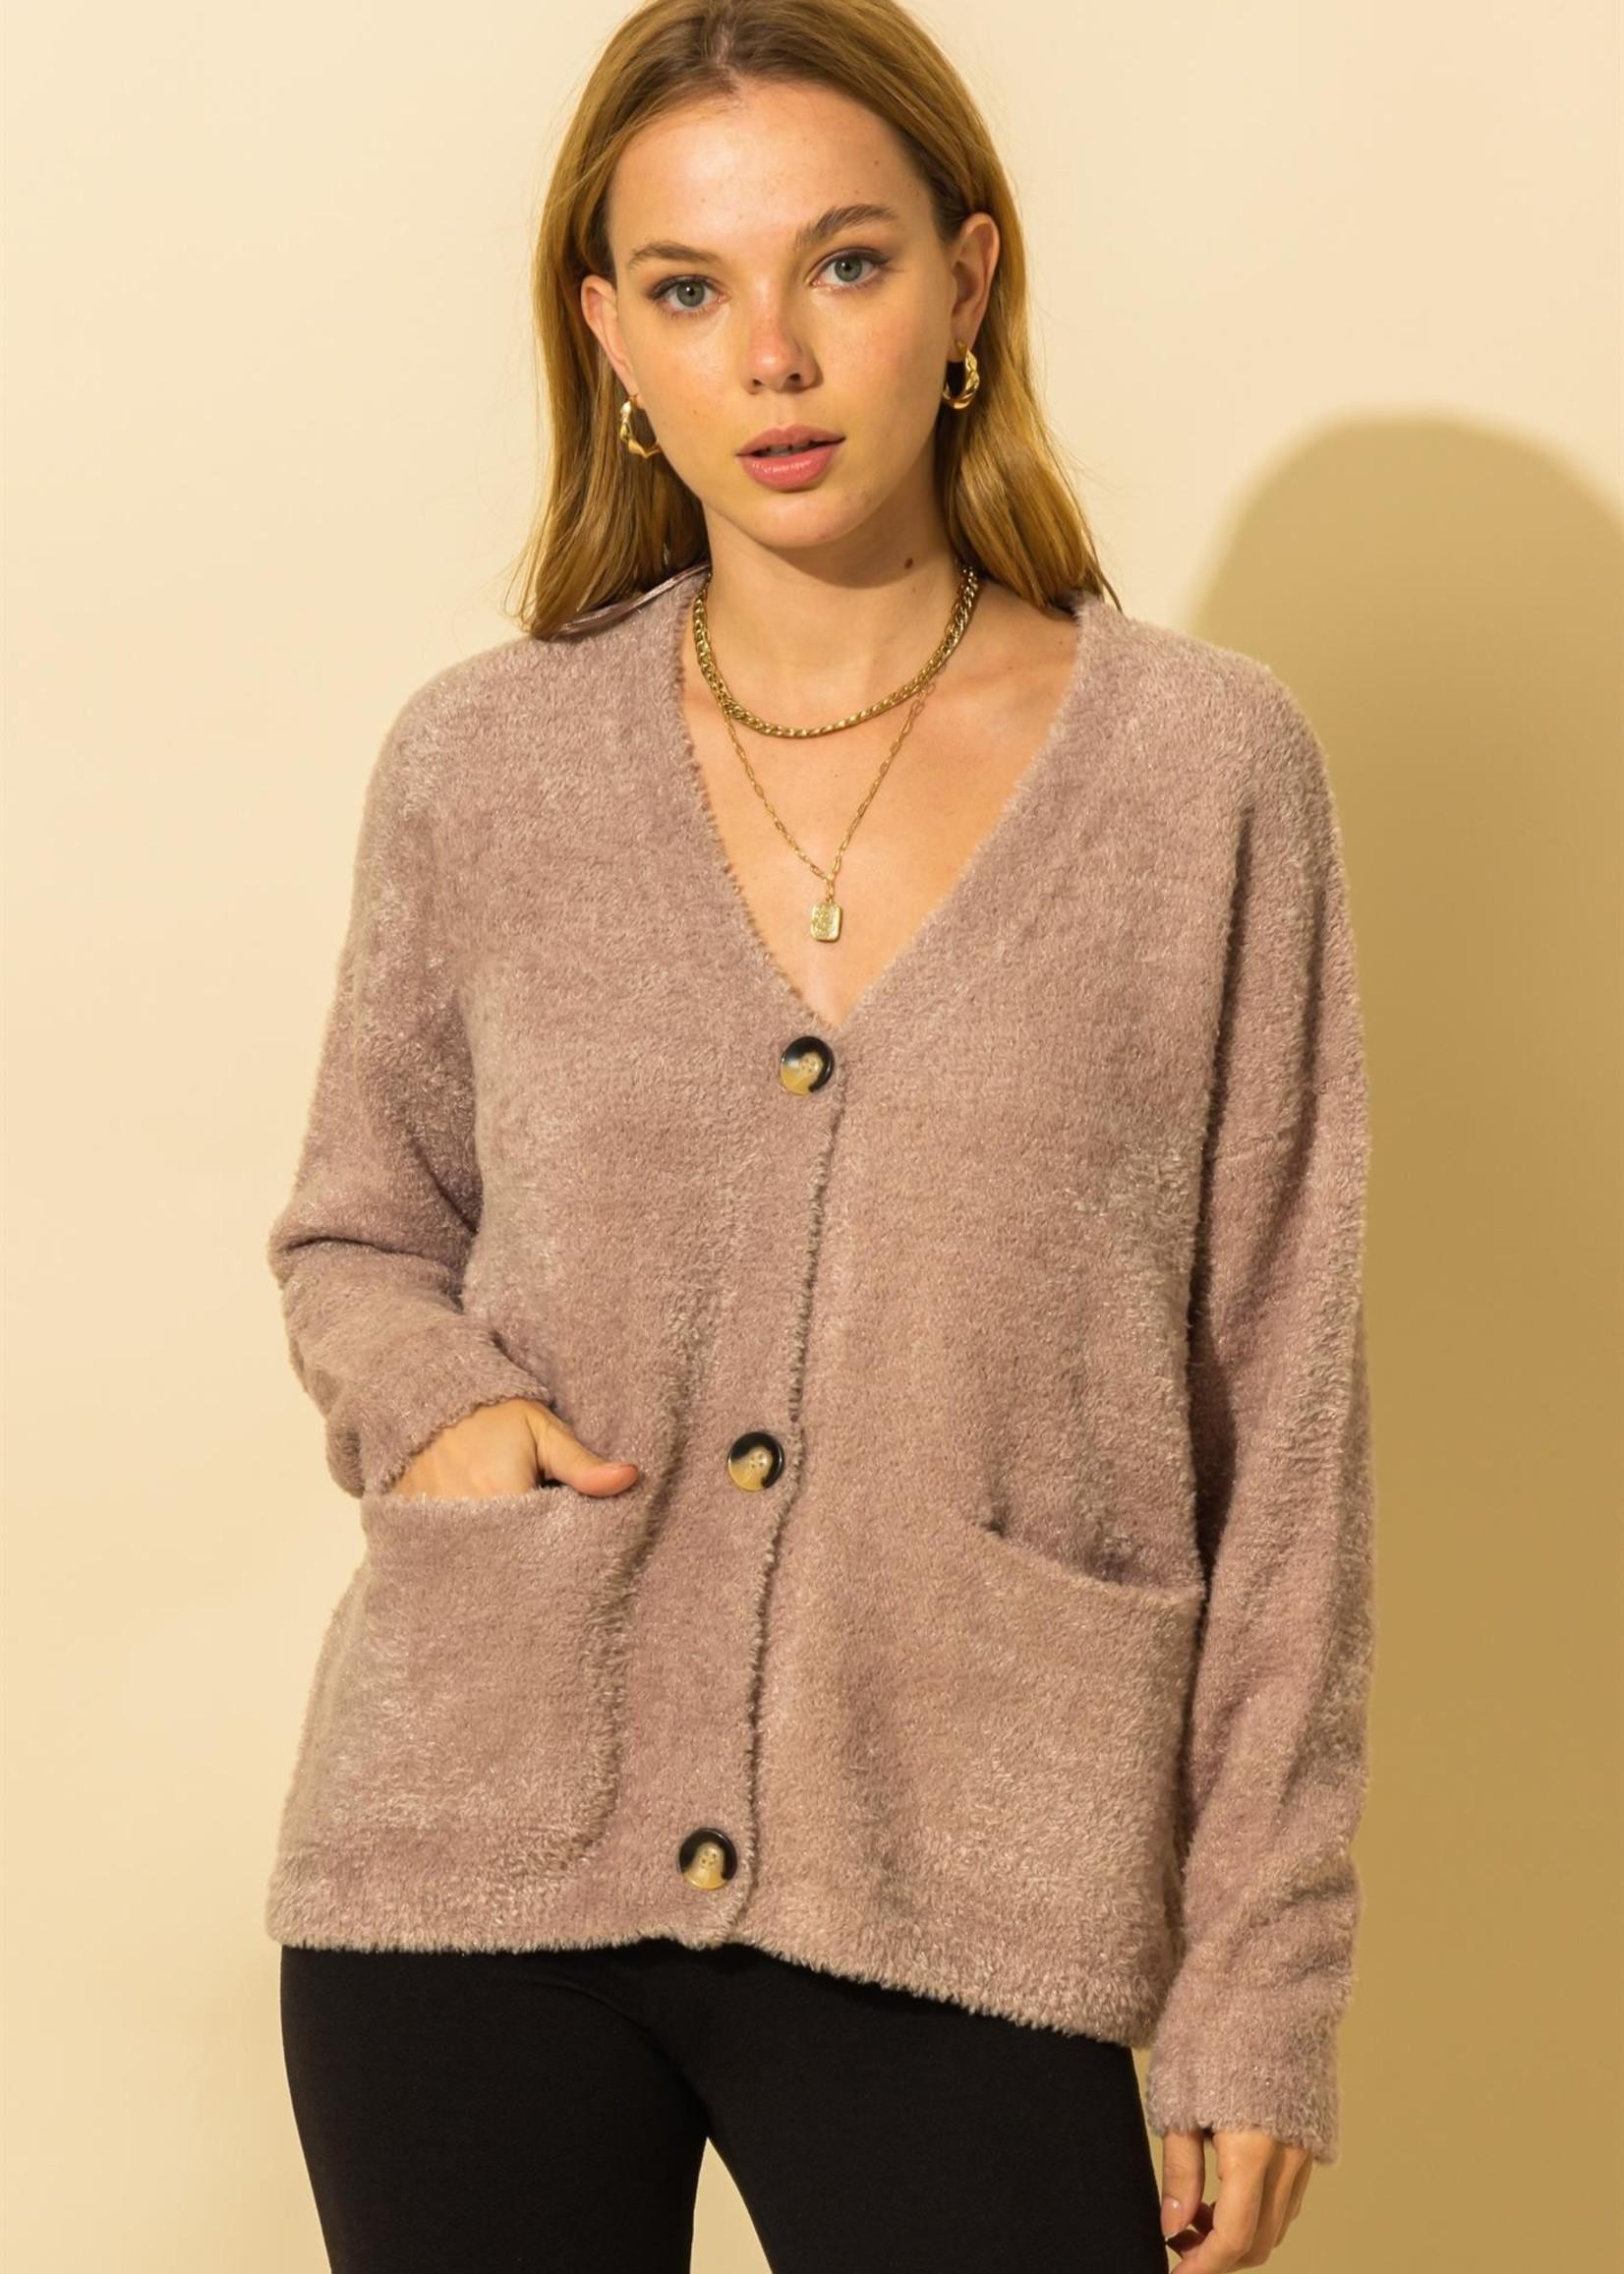 Fuzzy Button Up Cardigan - Mocha